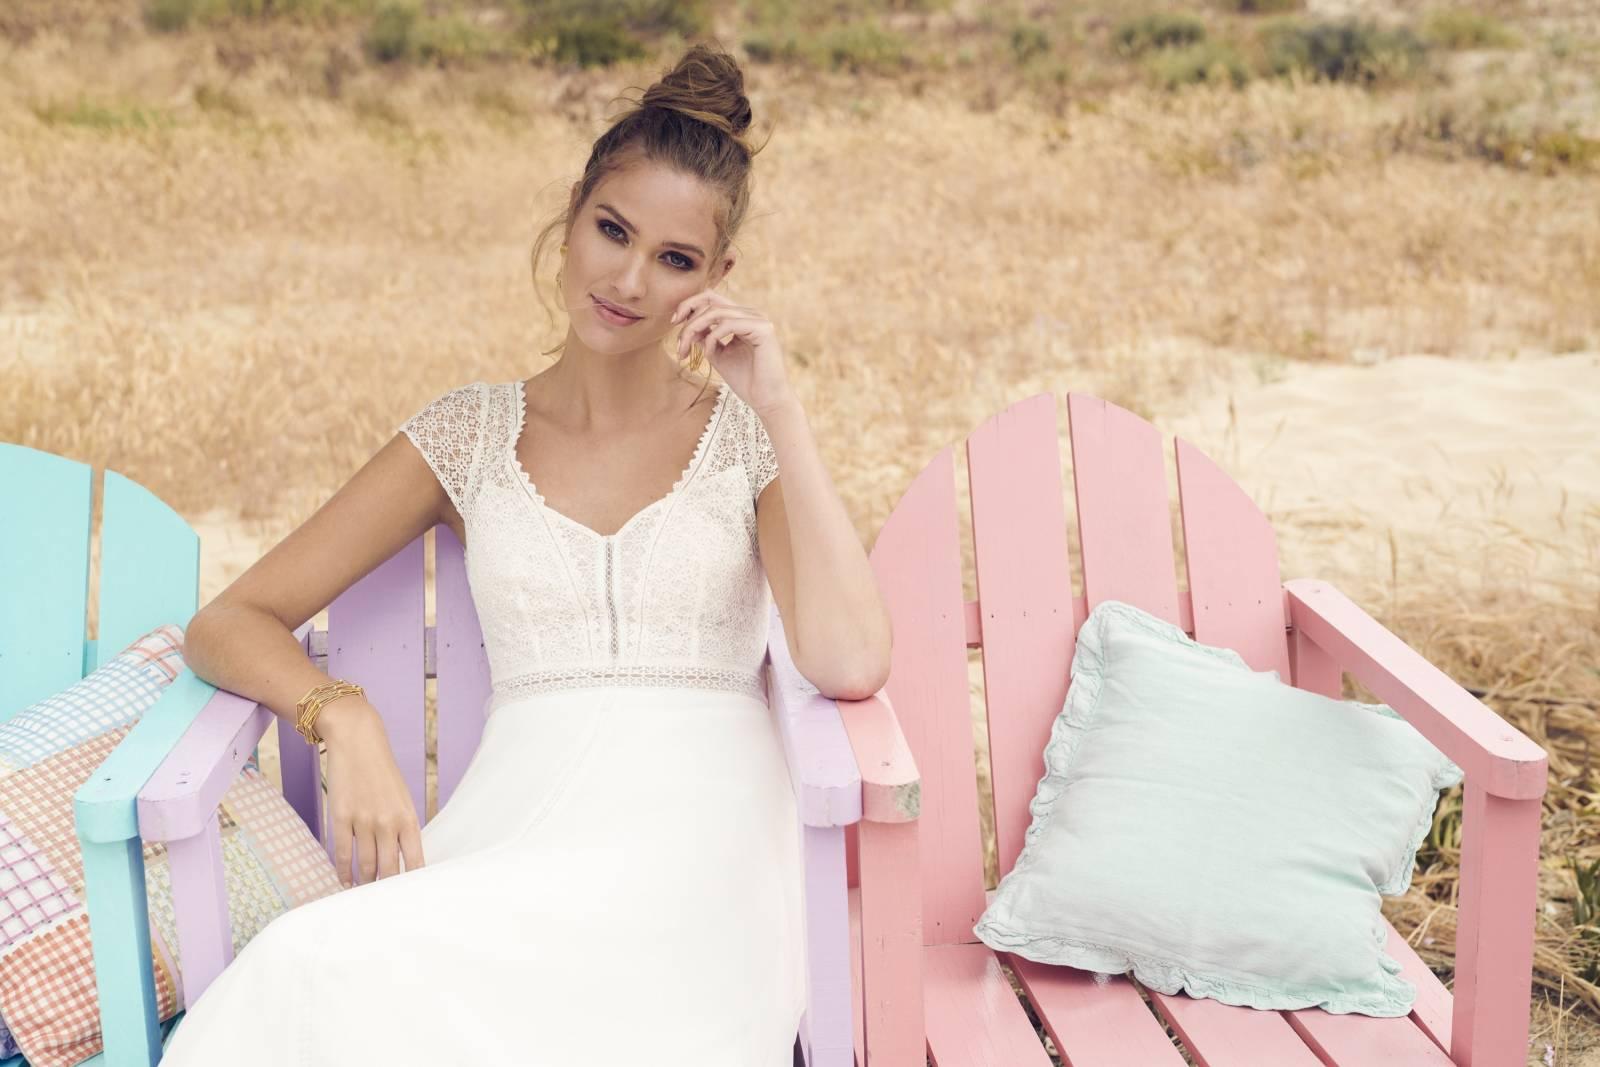 Cermo Concept - Bruidsmode winkel - Trouwjurk - Kostuum - House of Weddings - 17